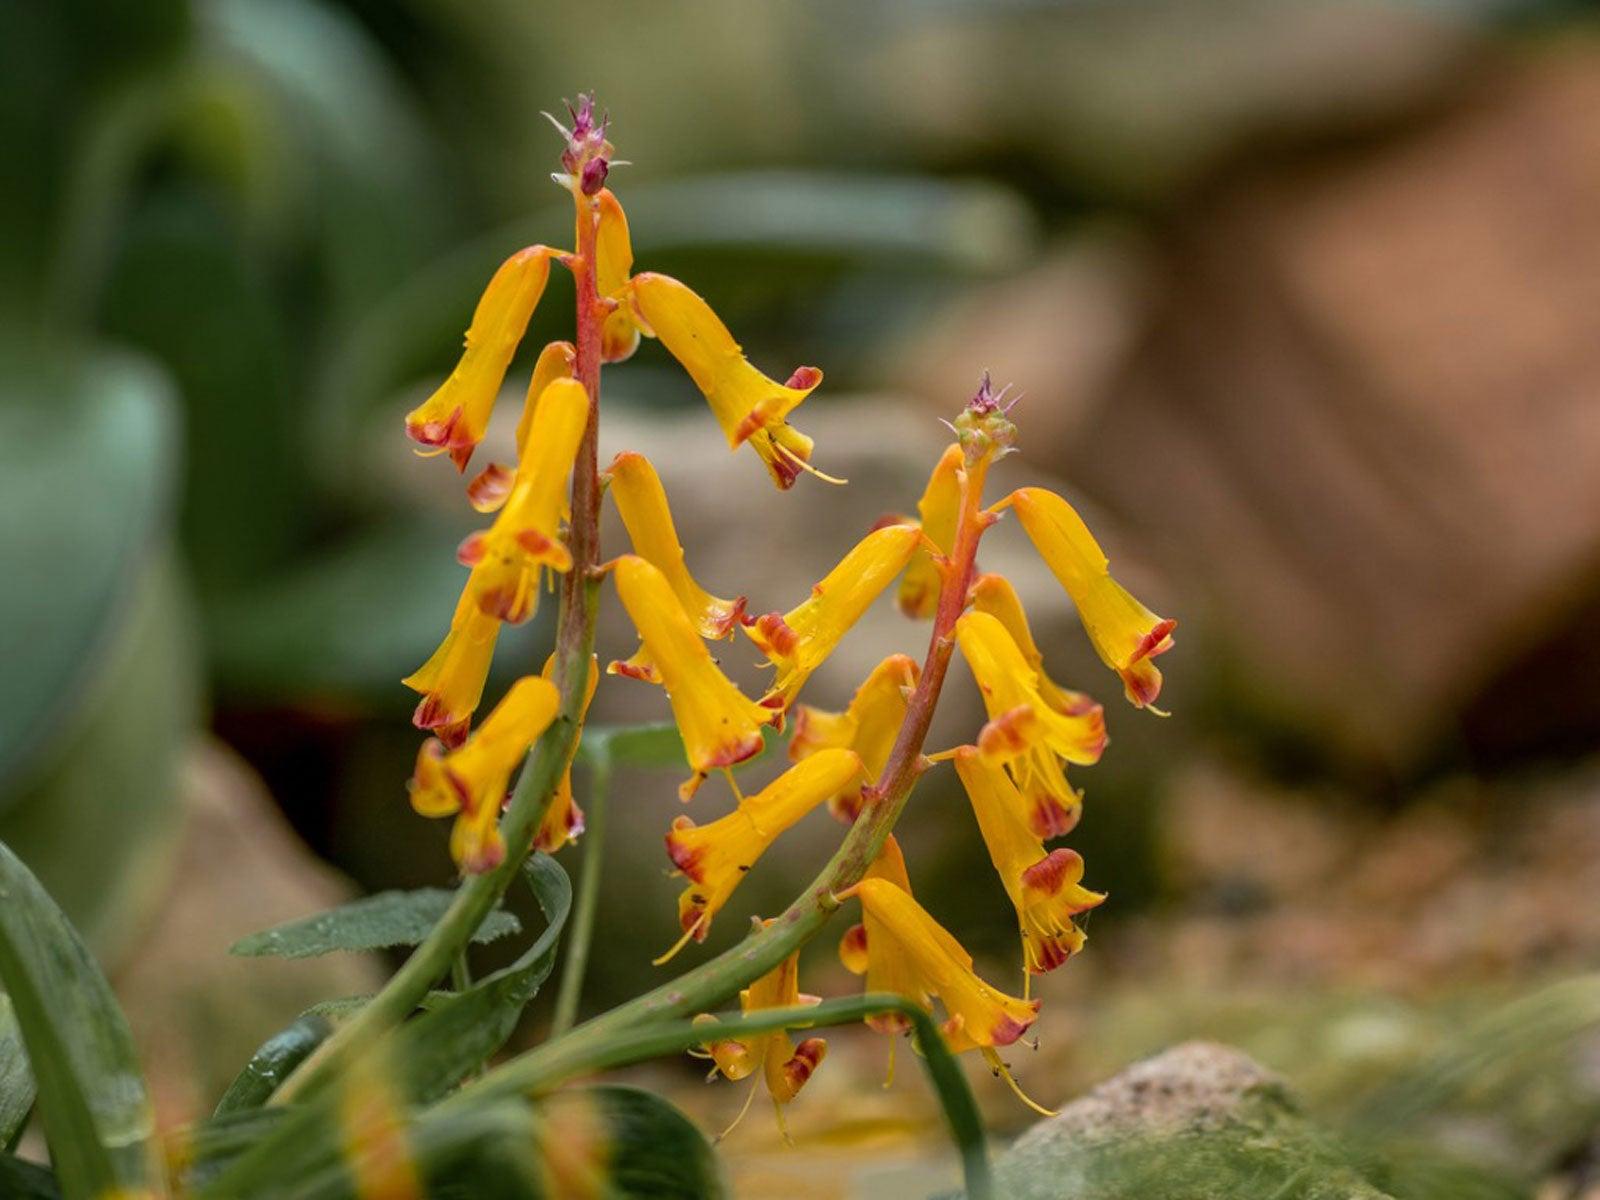 Lachenalia ensifolia ssp maughanii Polyxena FS bulb